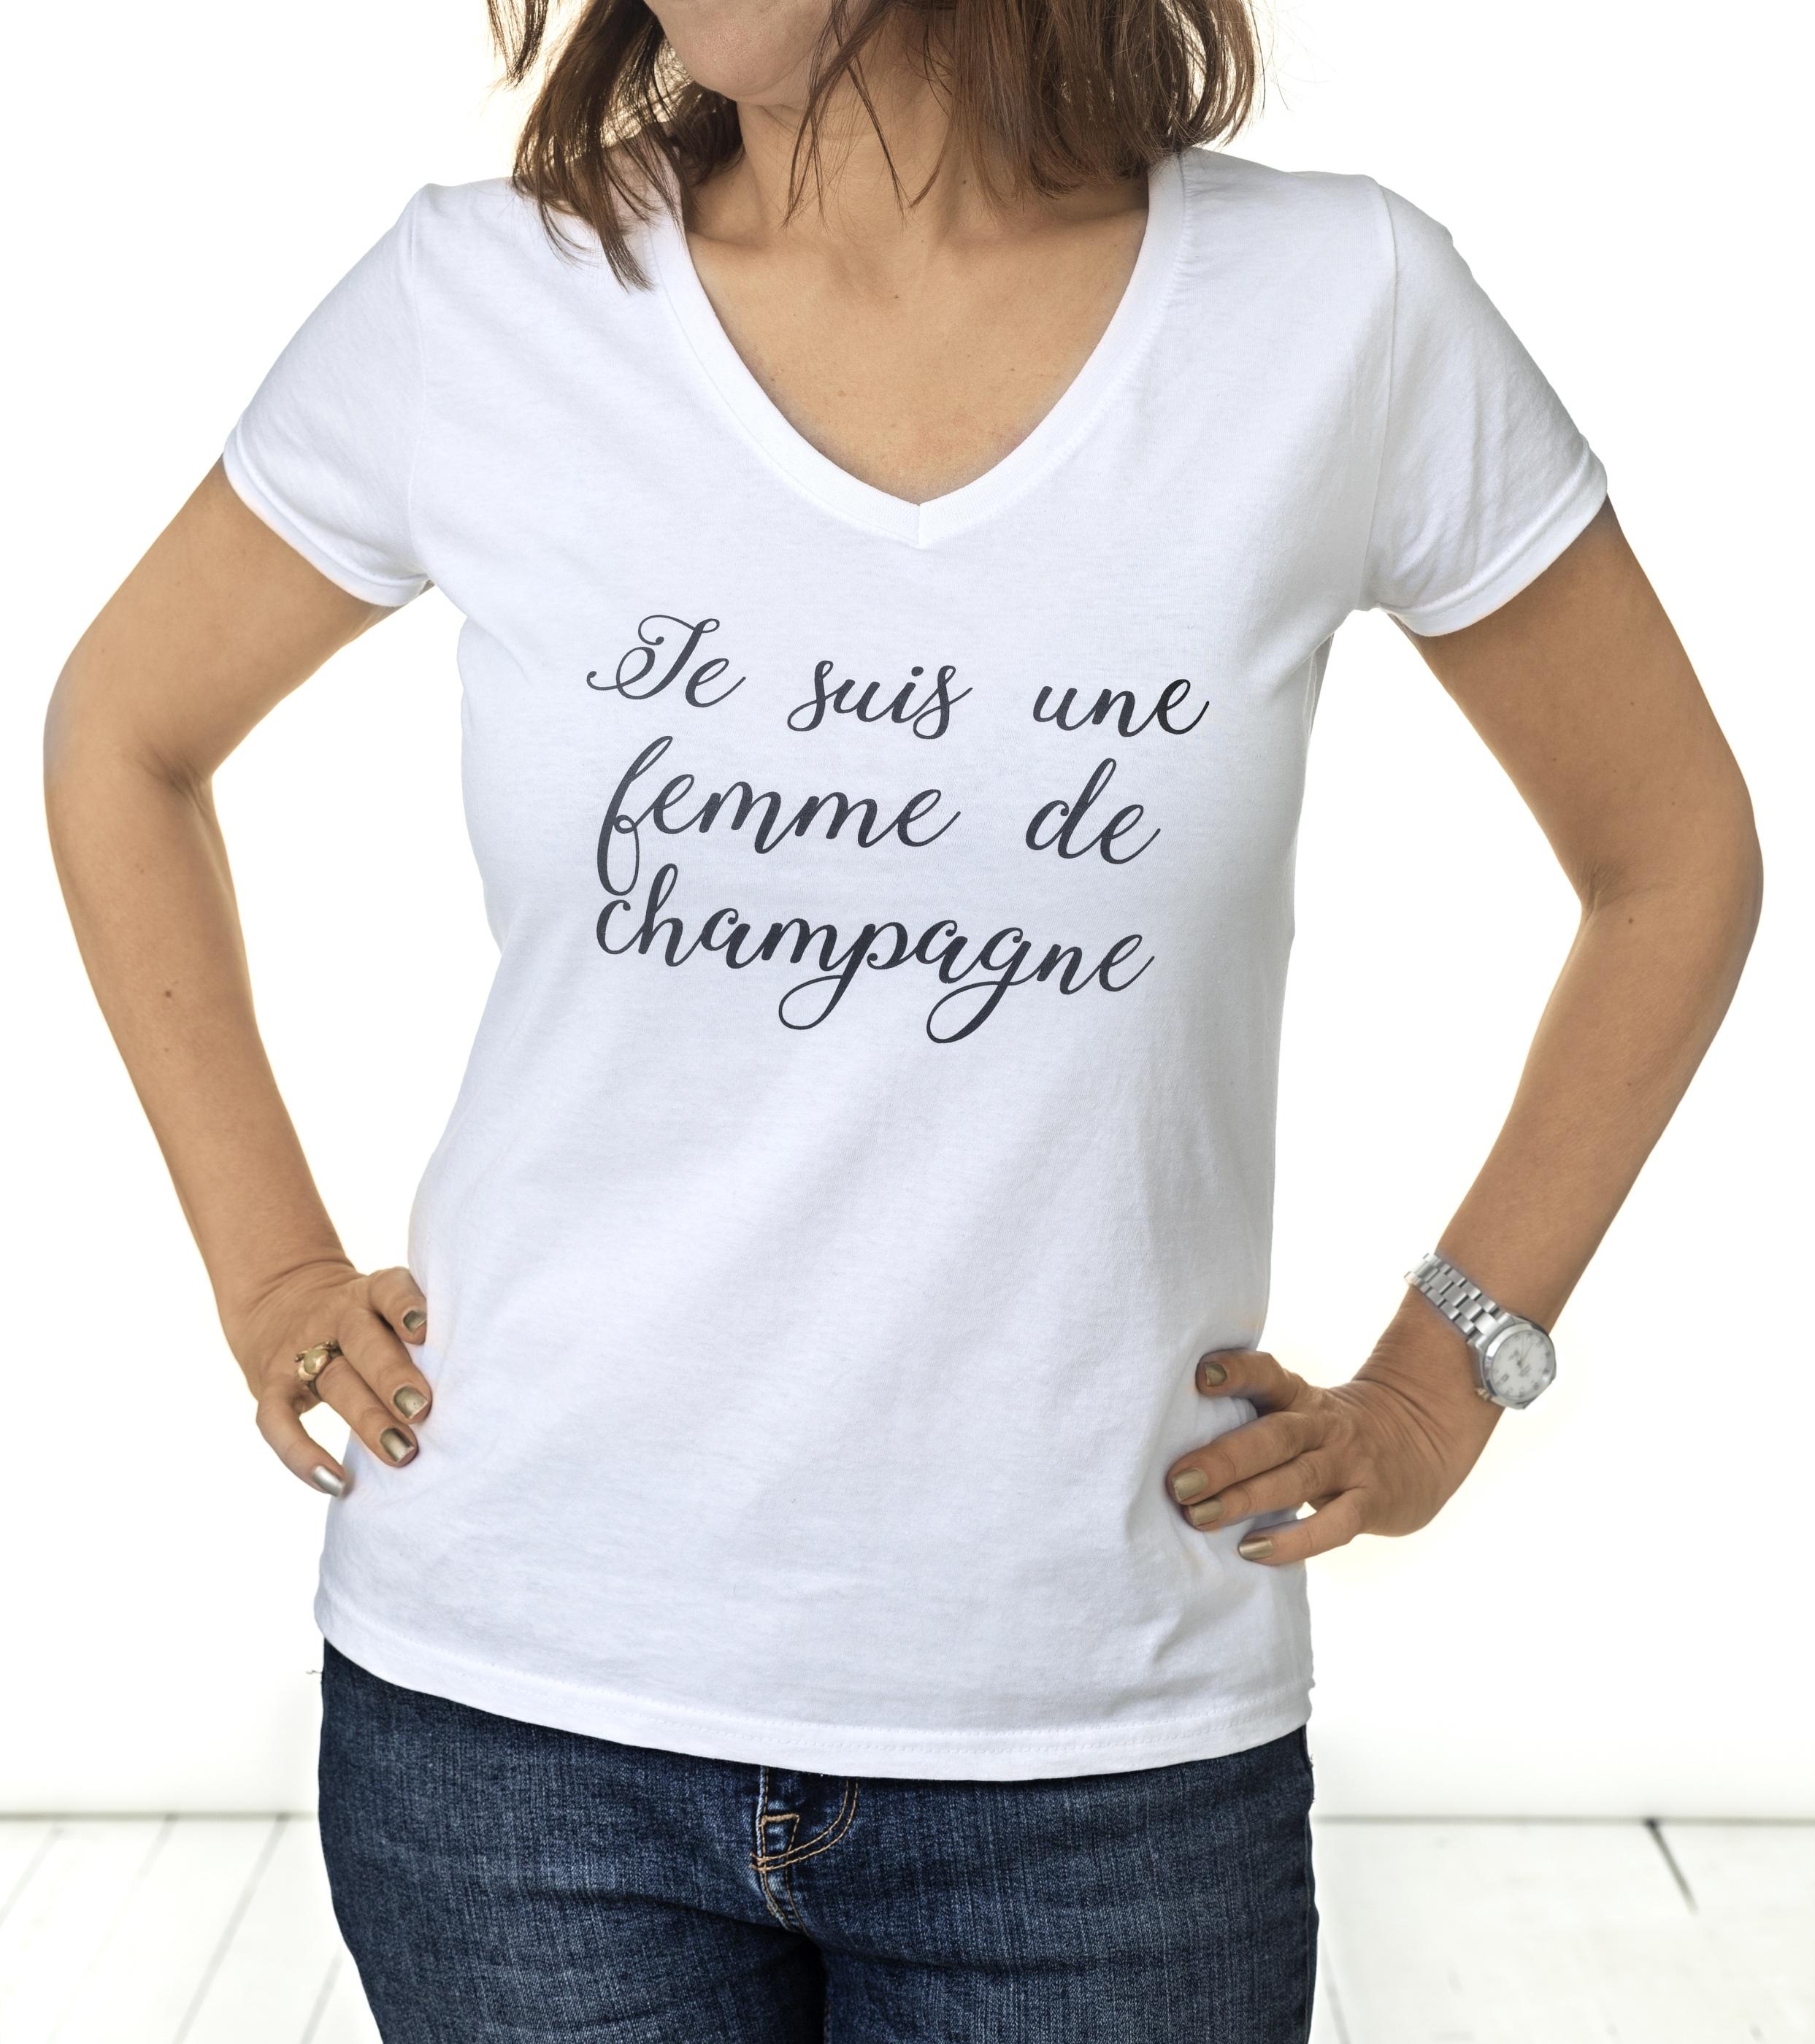 Vit champagne t-shirt